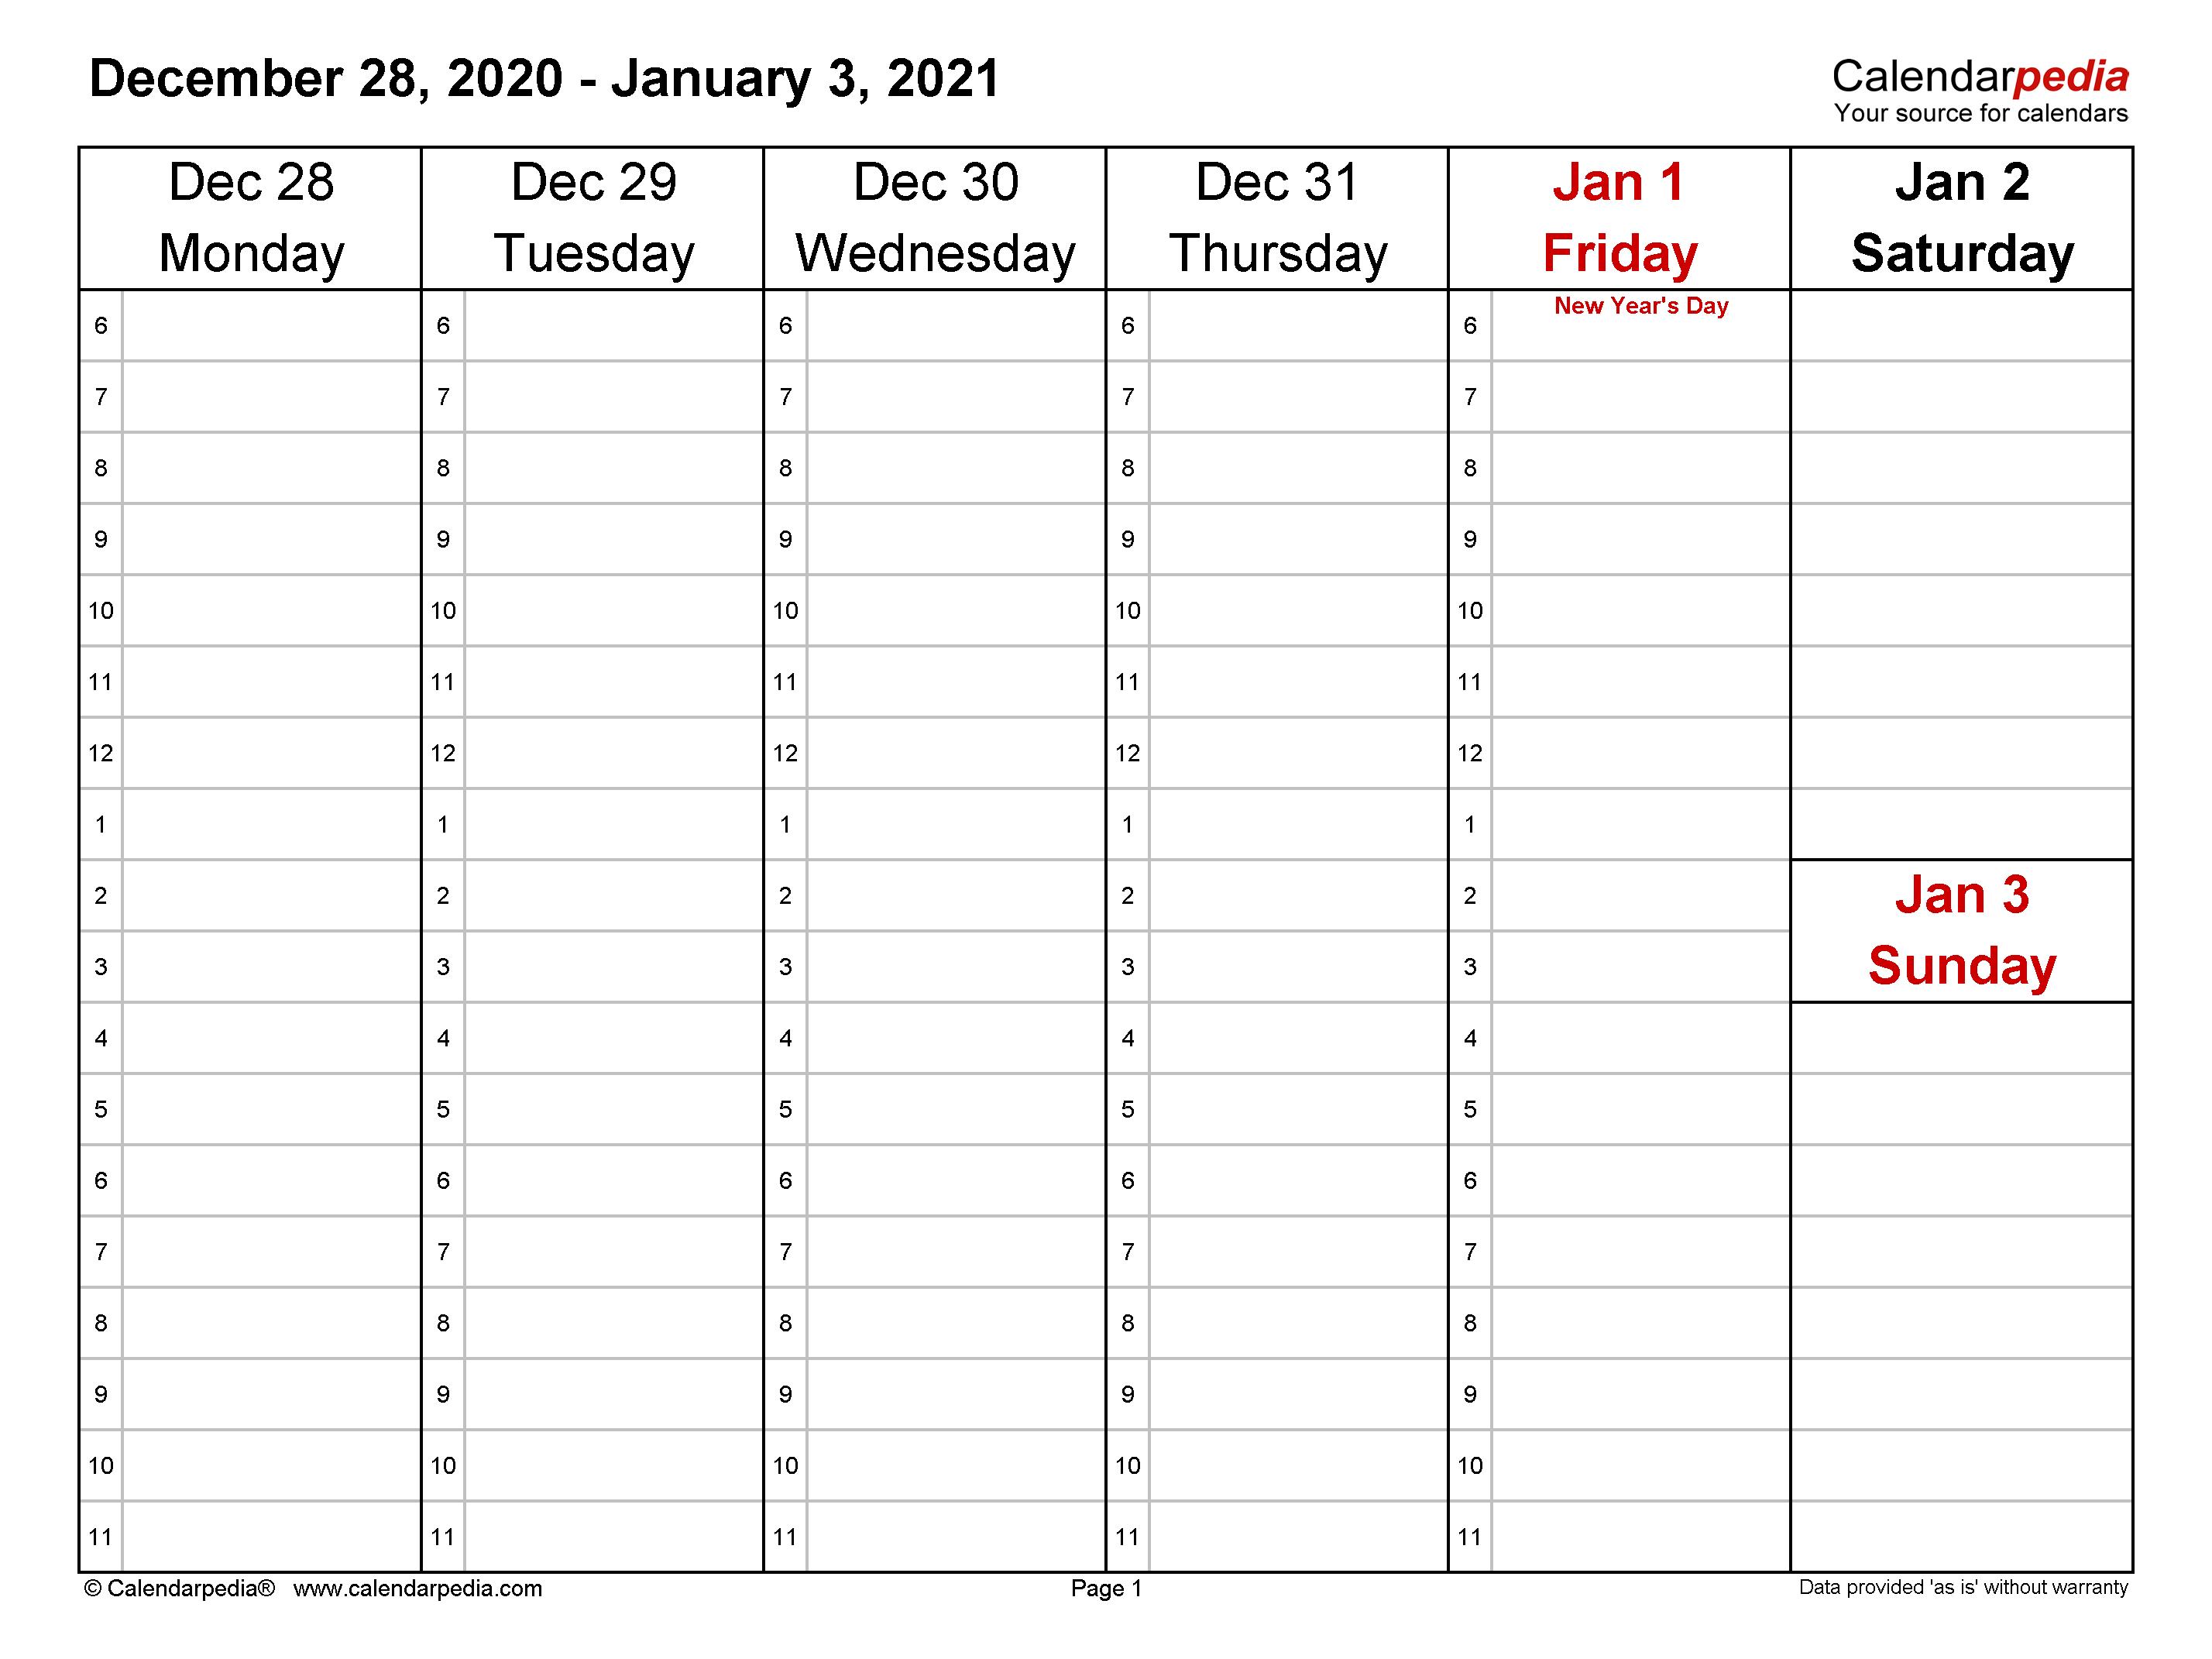 Free Downloadable 2021 Word Calendar - Take 2021 Printable ...